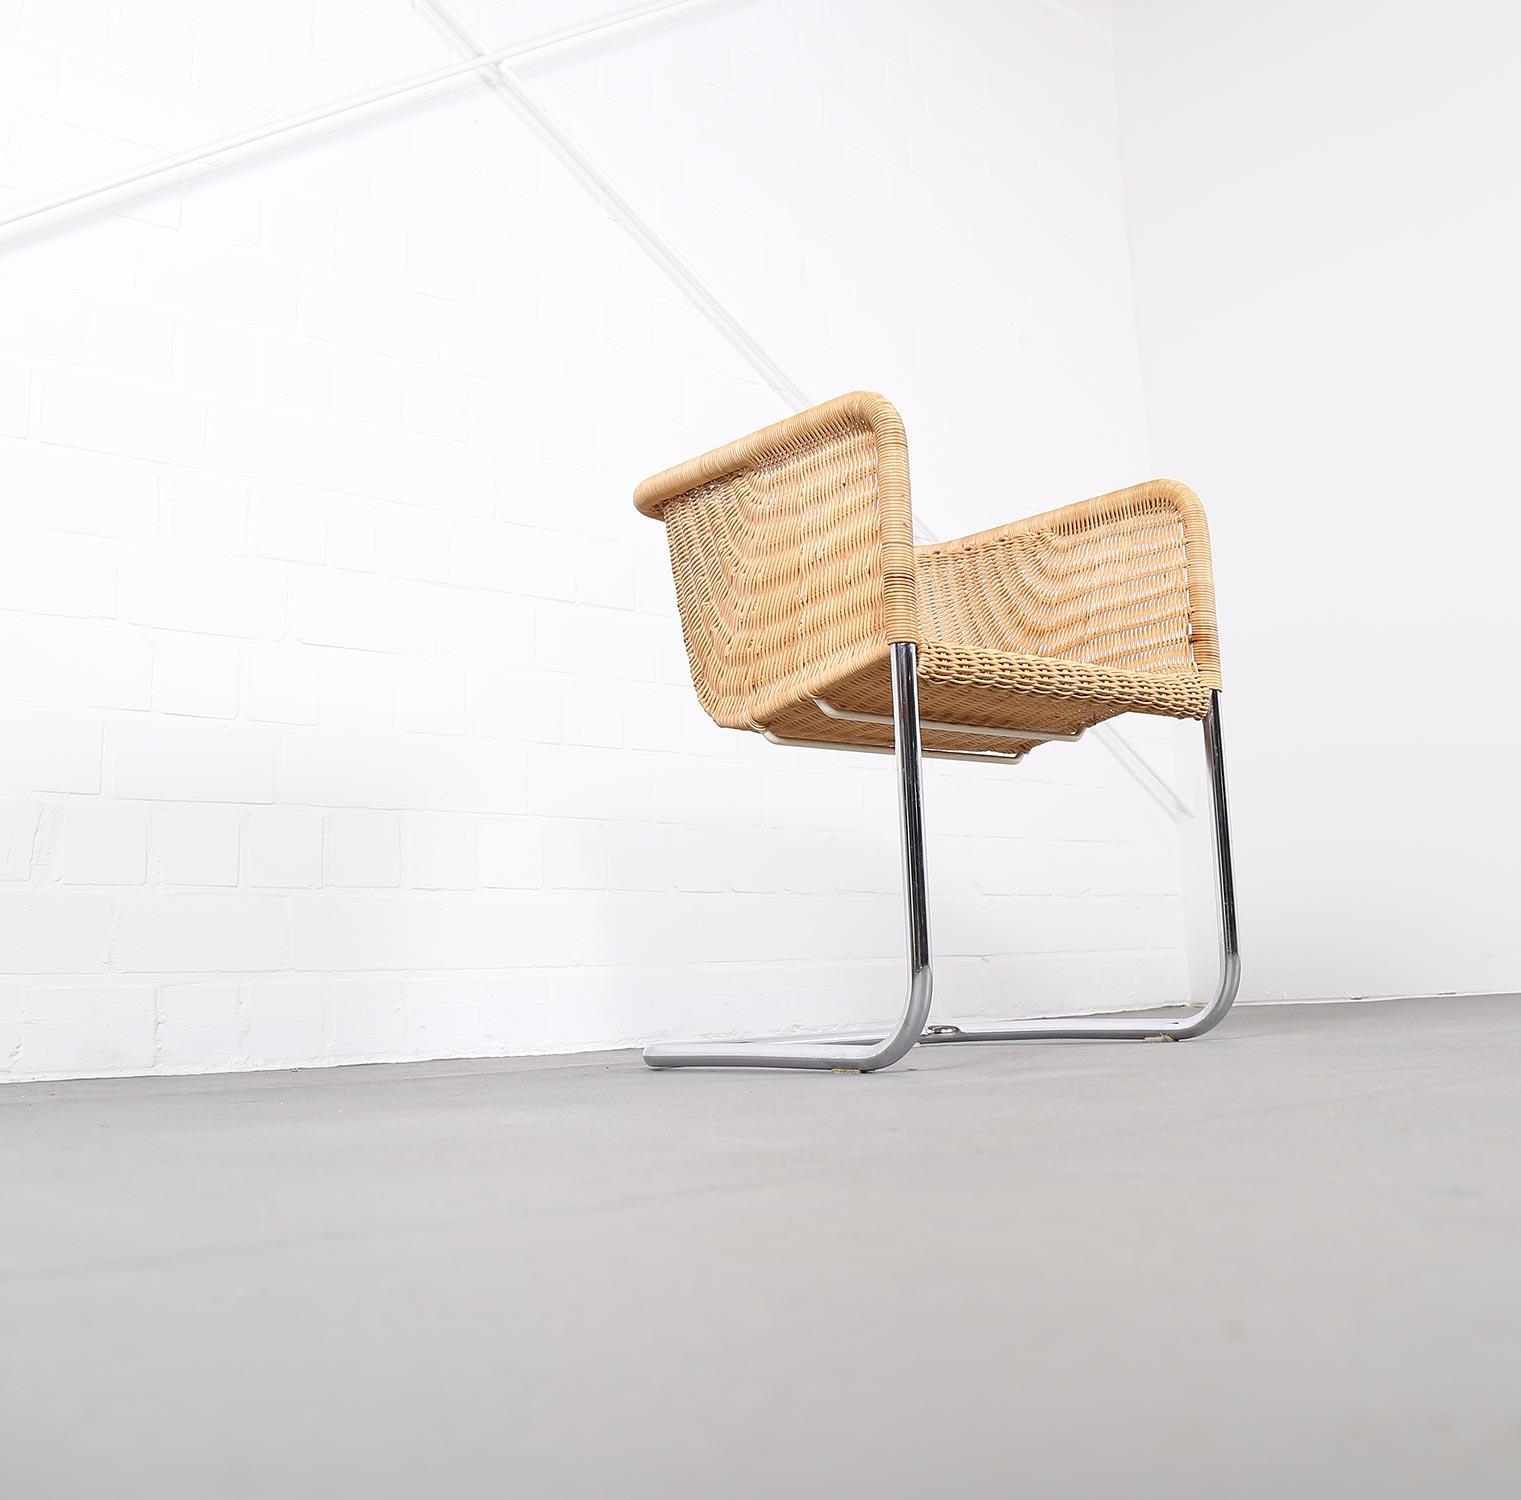 Bauhaus chairs d43 stahlrohr freischwinger by tecta for Stuhl design bauhaus